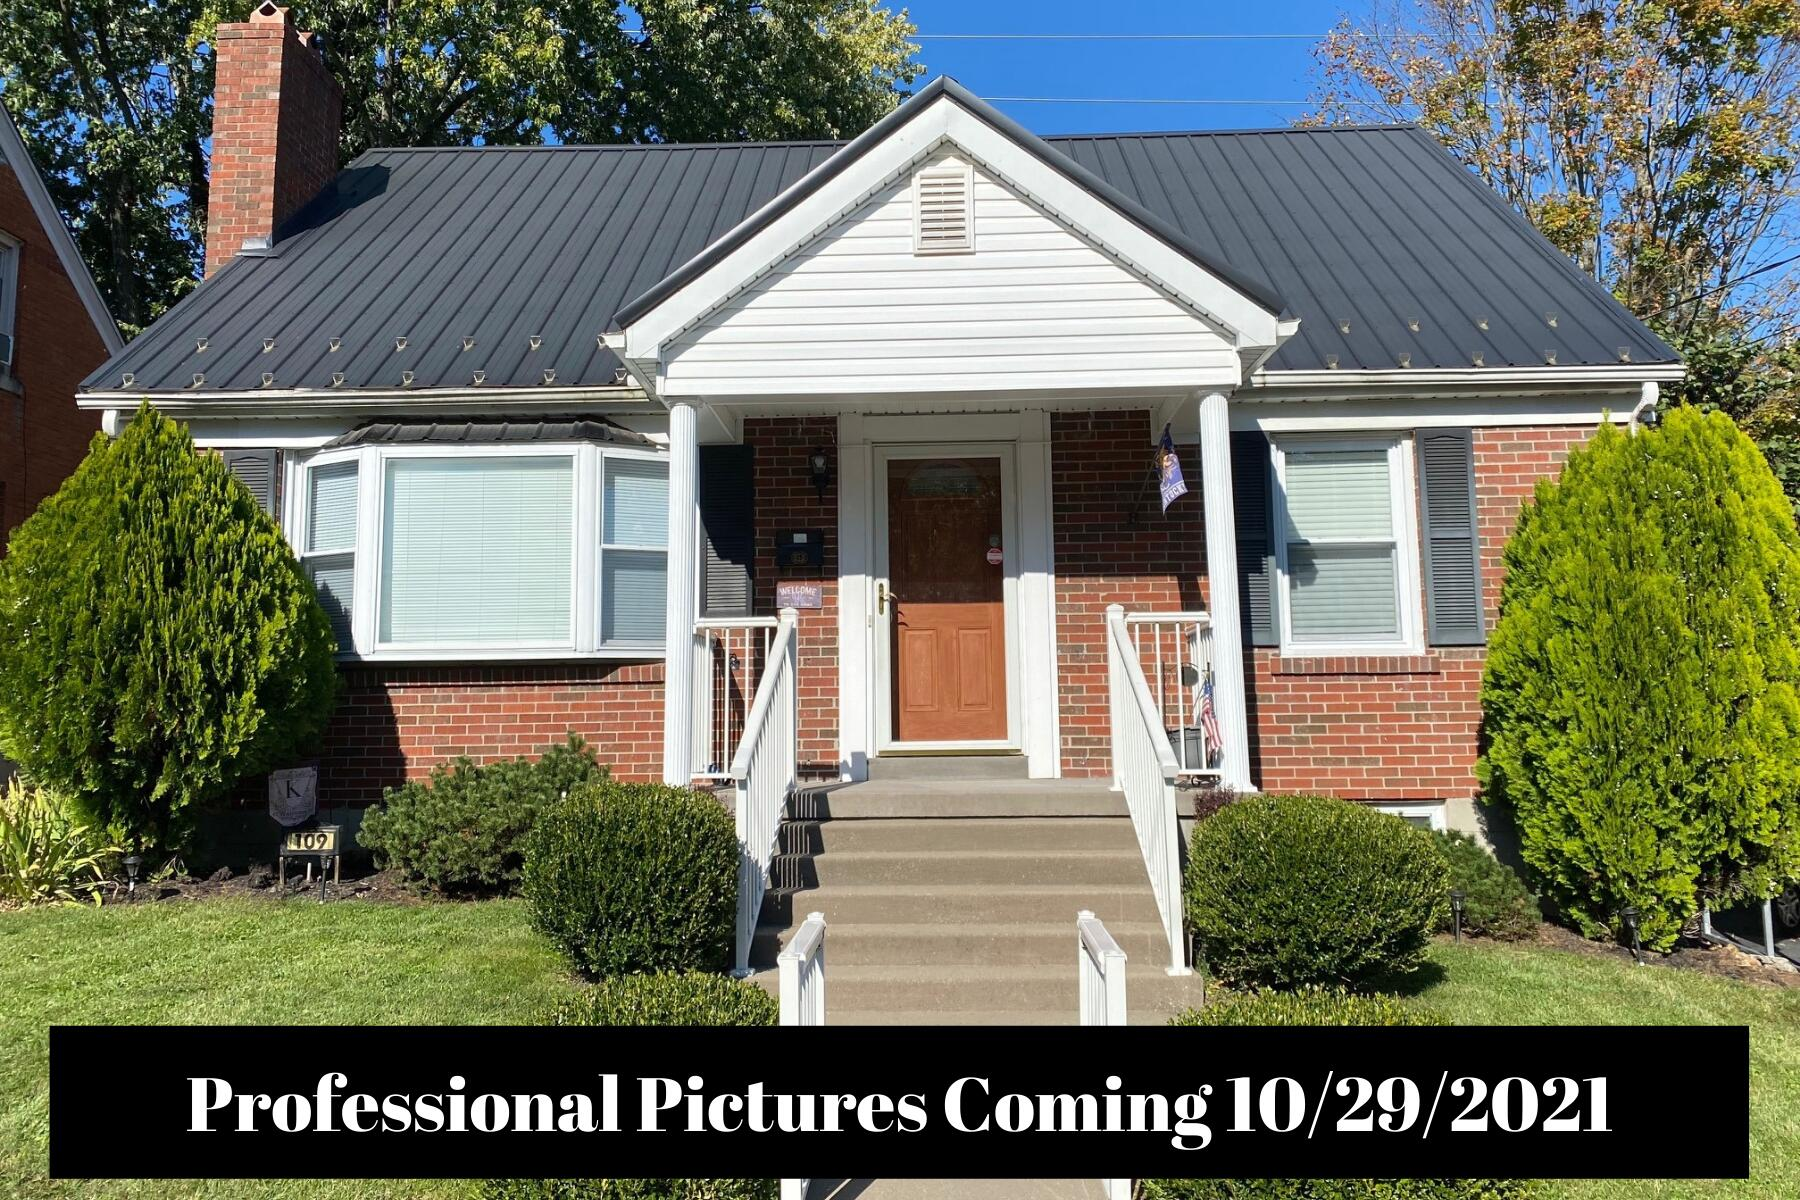 109 McWhorter Court, Richmond, Kentucky 40475, 3 Bedrooms Bedrooms, ,2 BathroomsBathrooms,Residential,For Sale,McWhorter,20122835